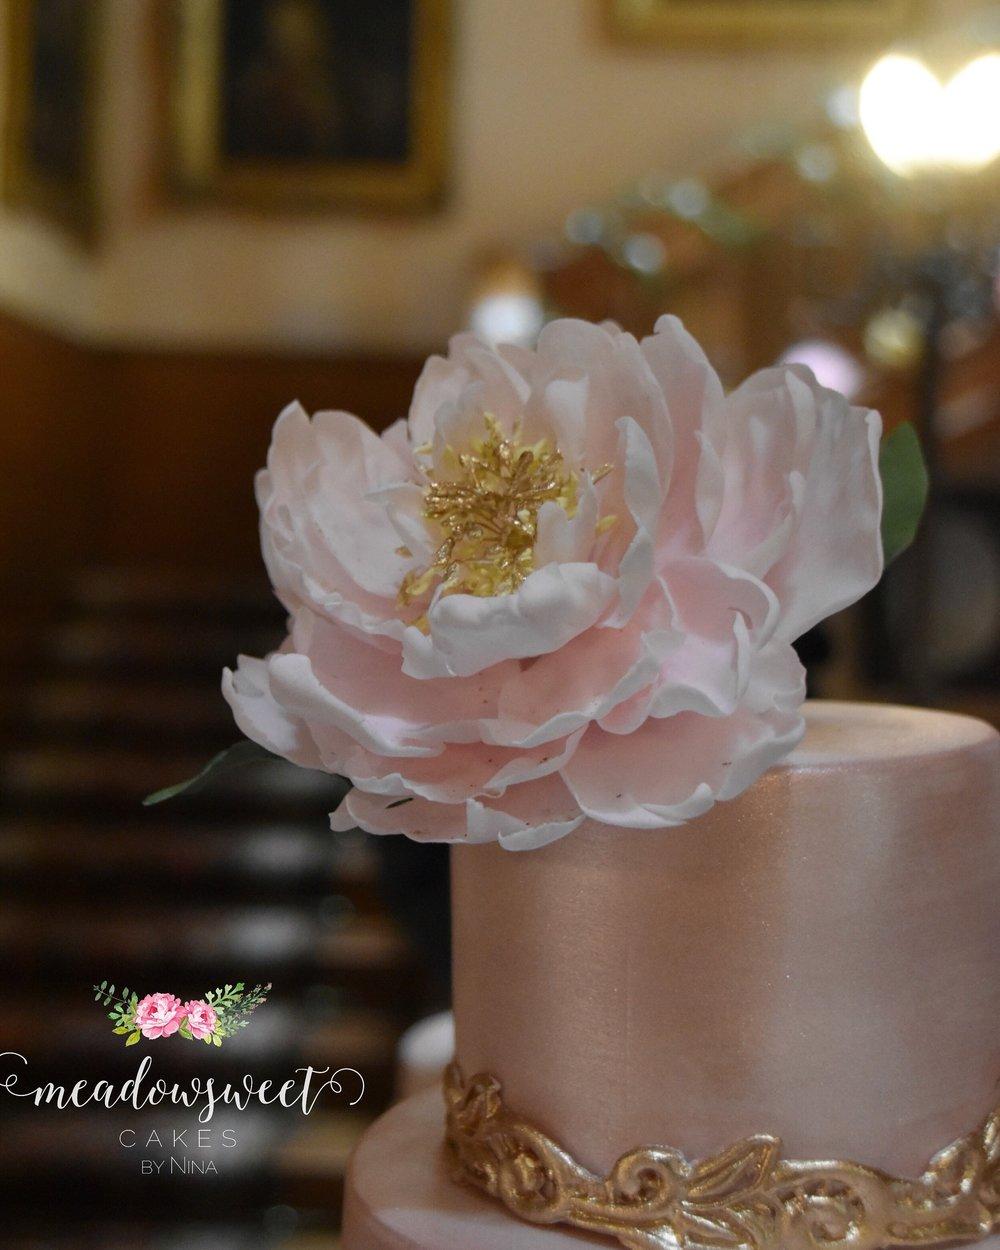 Sugar flower and rose gold wedding cake inspiration meadowsweet cakes